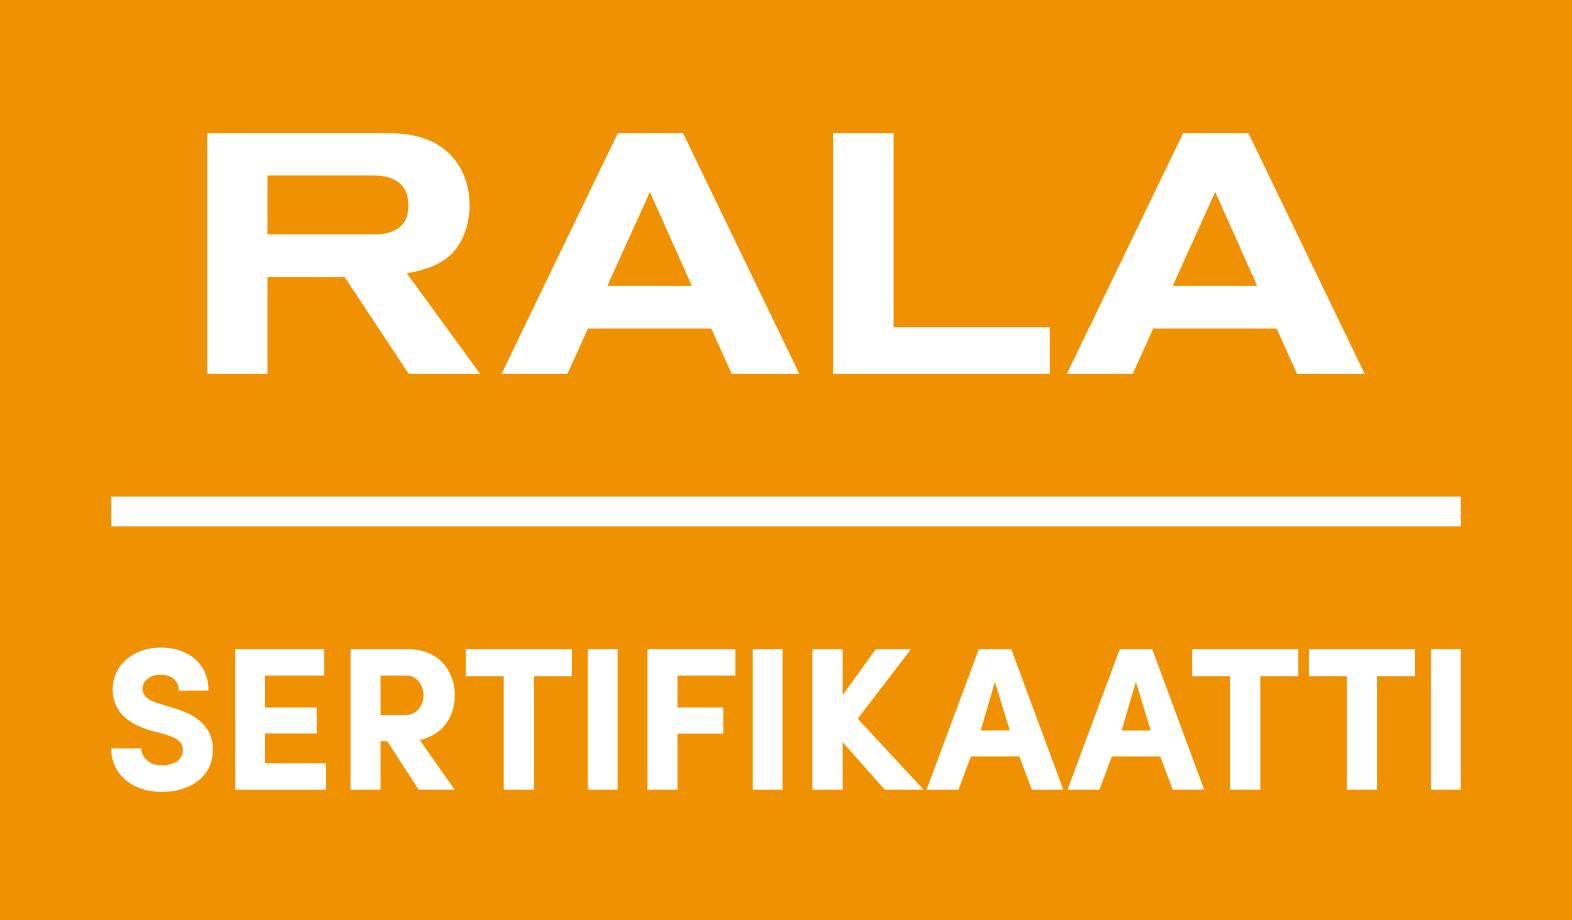 RALA_sertifikaatti_RGB.png